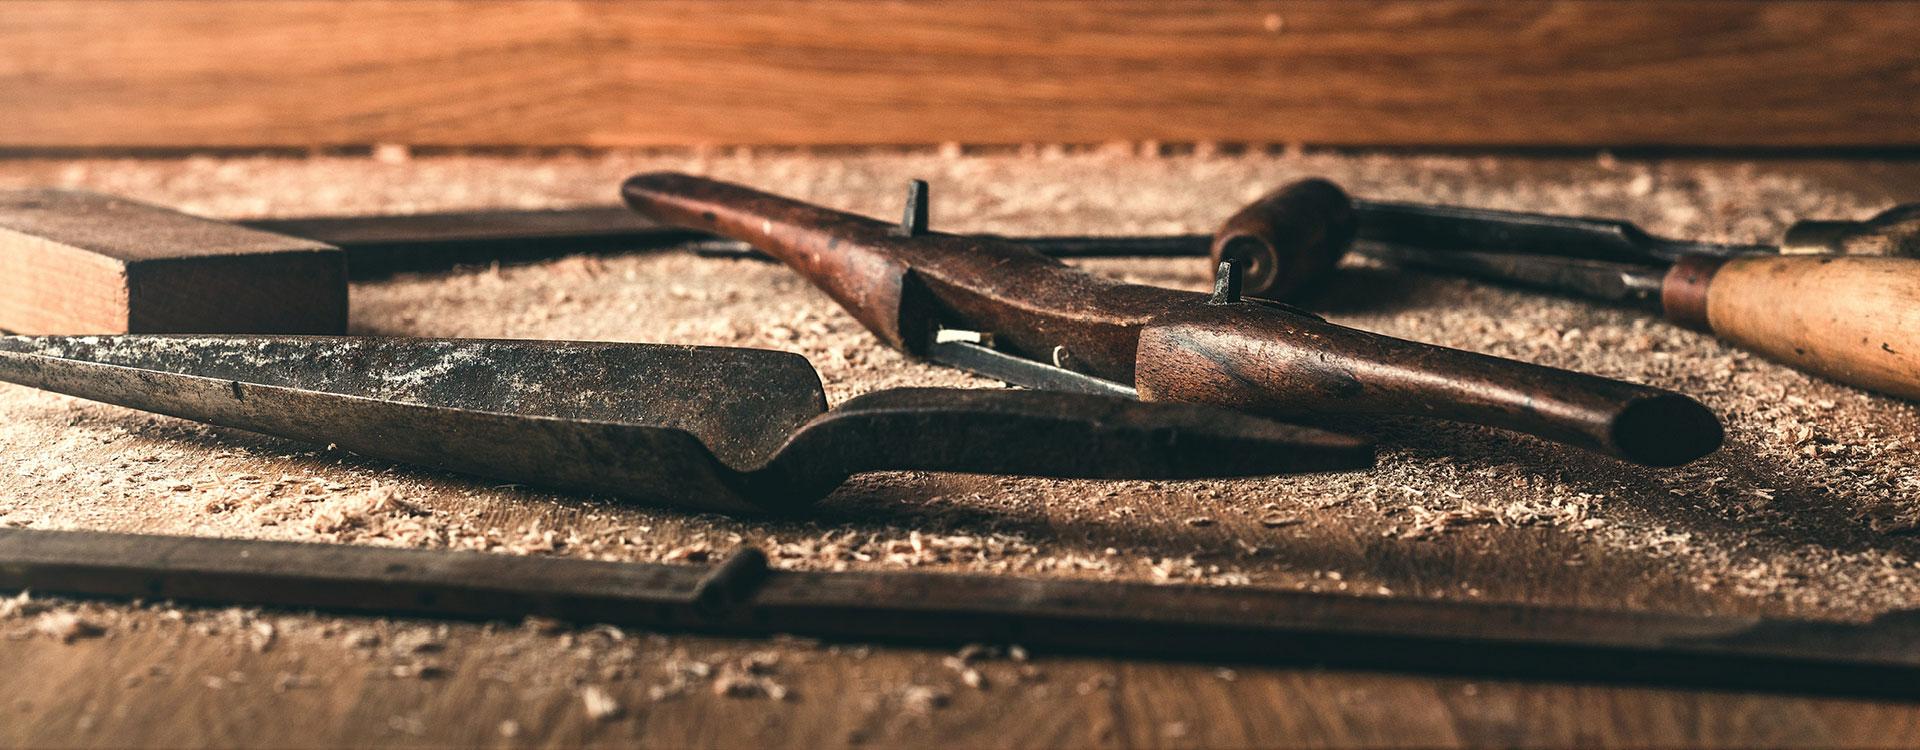 Plain-Creative-MAKE-Joinery-Tools